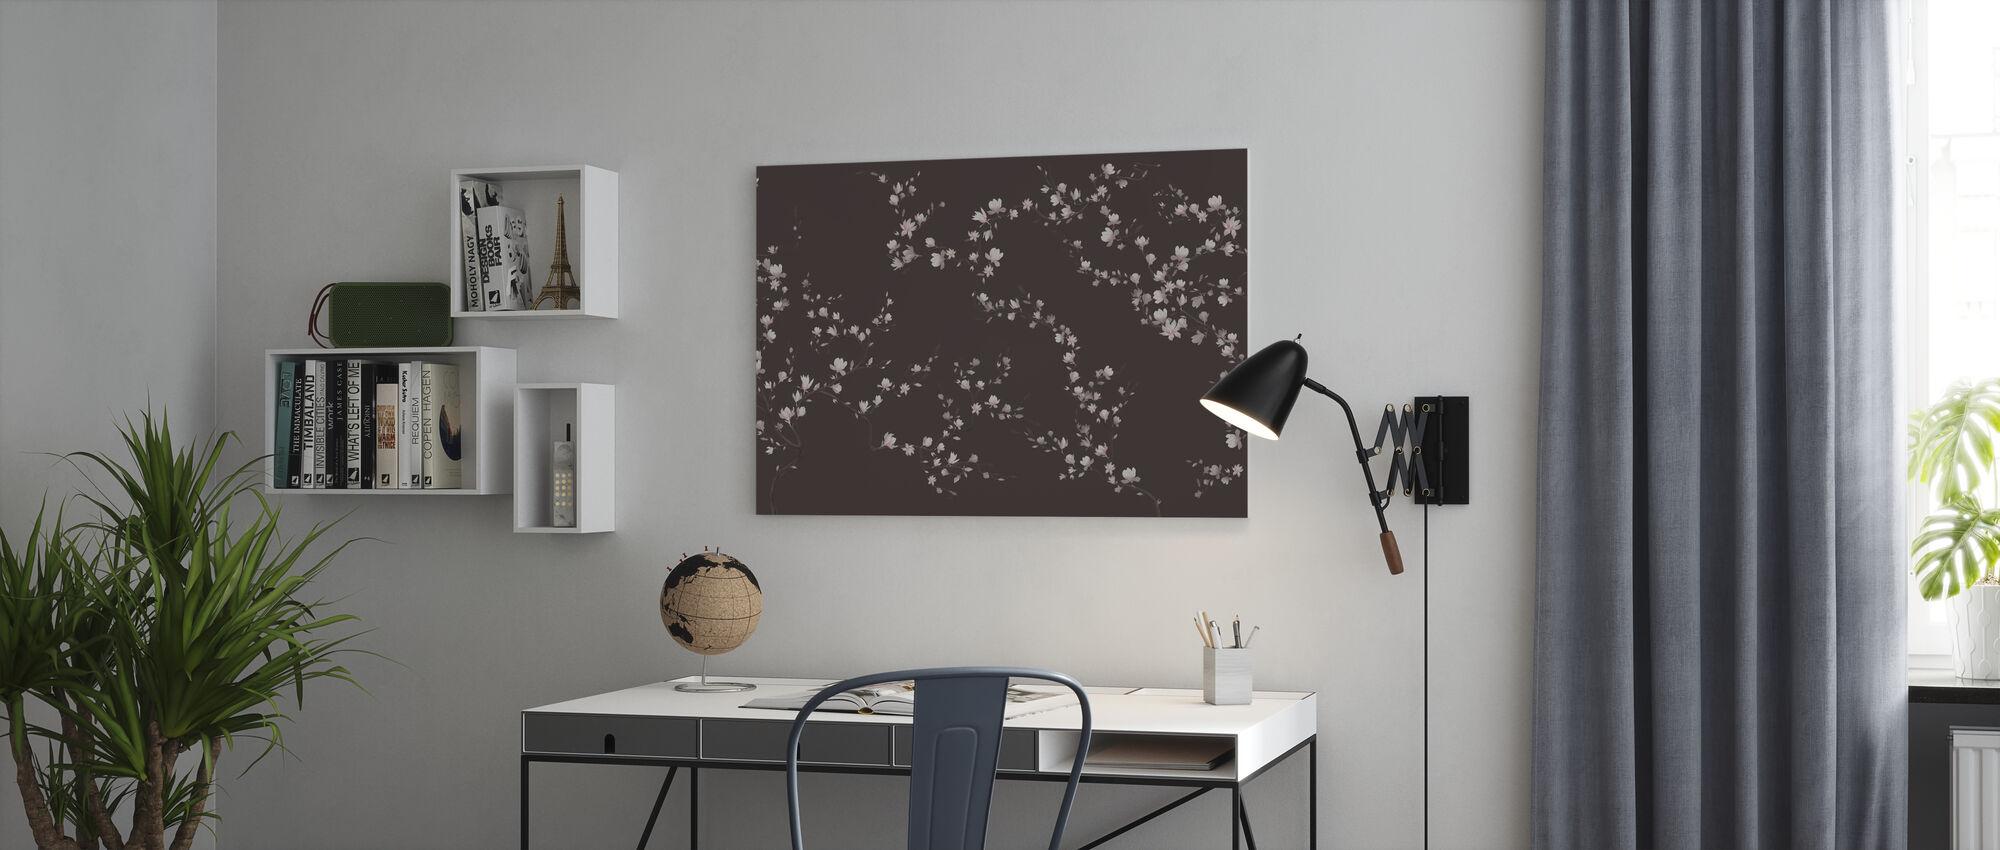 Flourishing Magnolia - Cold Brown - Canvas print - Office